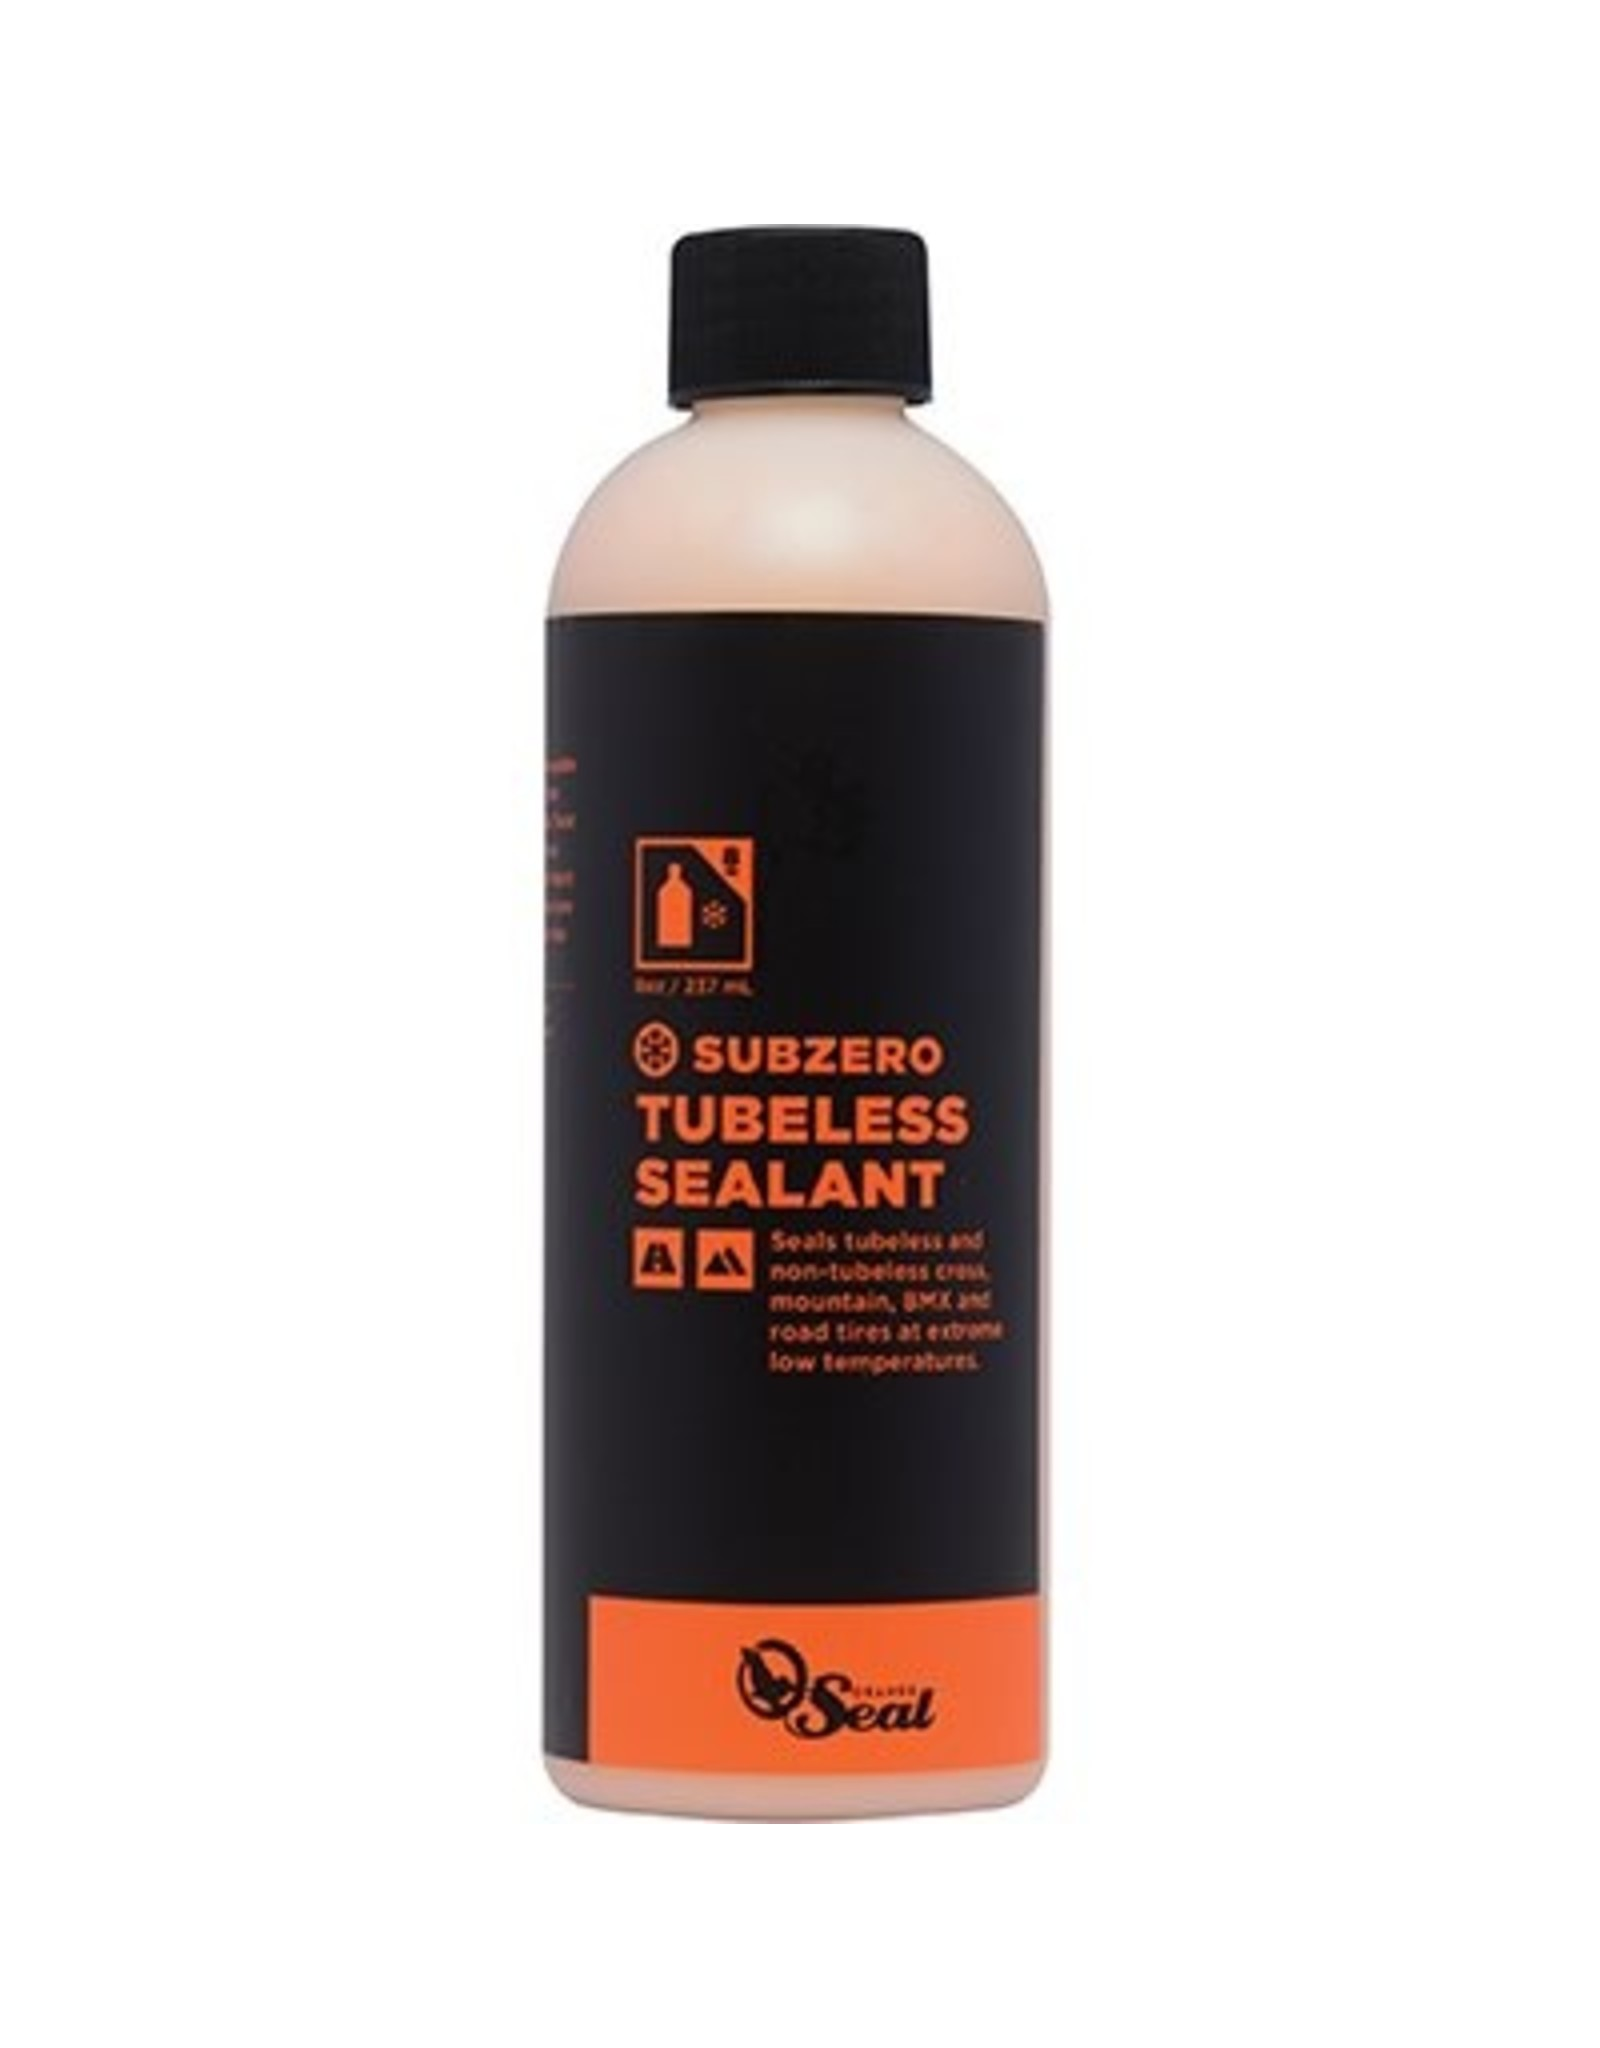 Orange Seal Scellant A pneu Subzero Orange Seal Cycling Recharge 8 oz/236 ml actif sous 0/32 degrEs